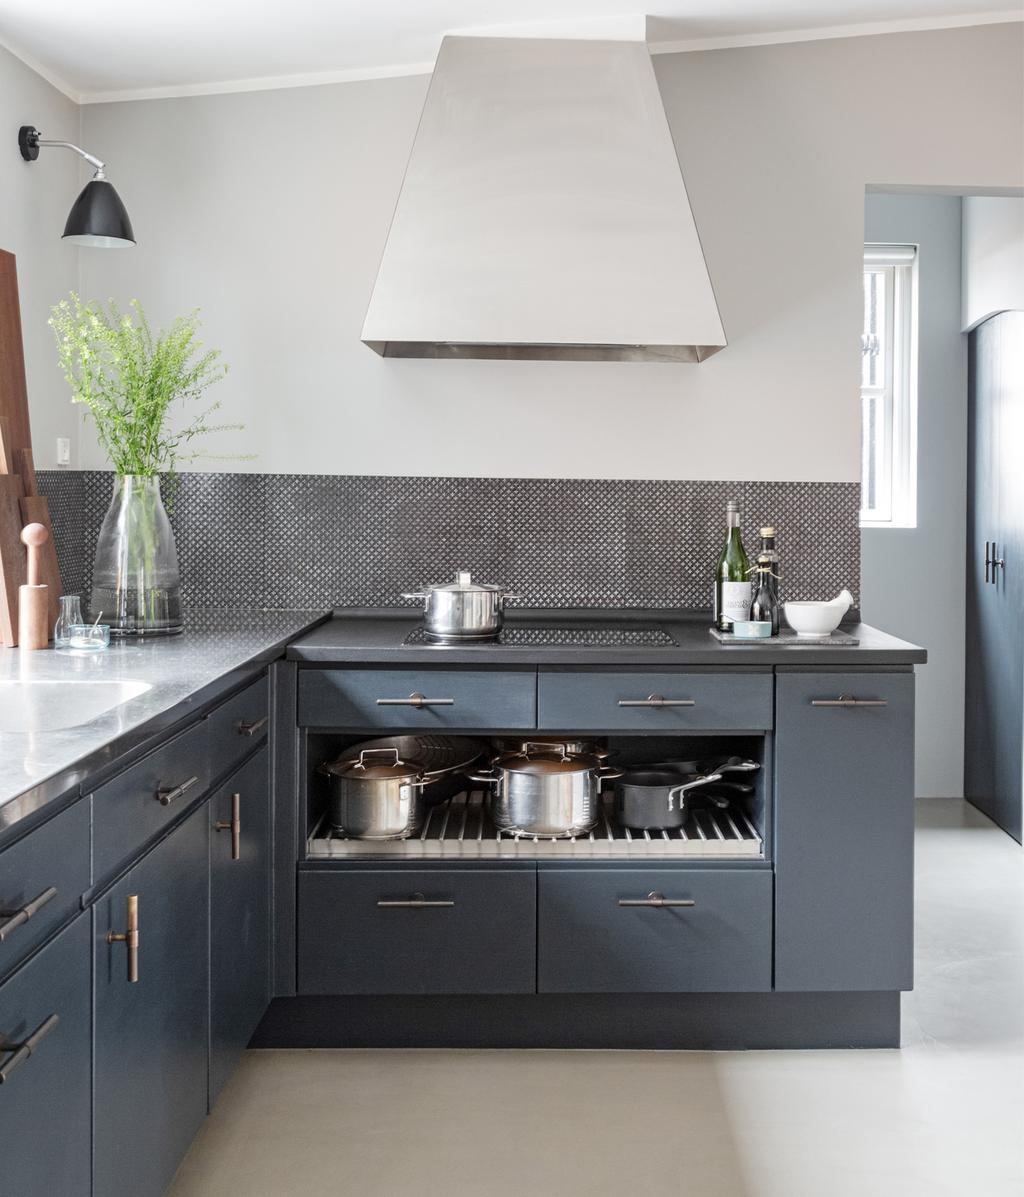 Blauwe keuken | vtwonen 13-2020